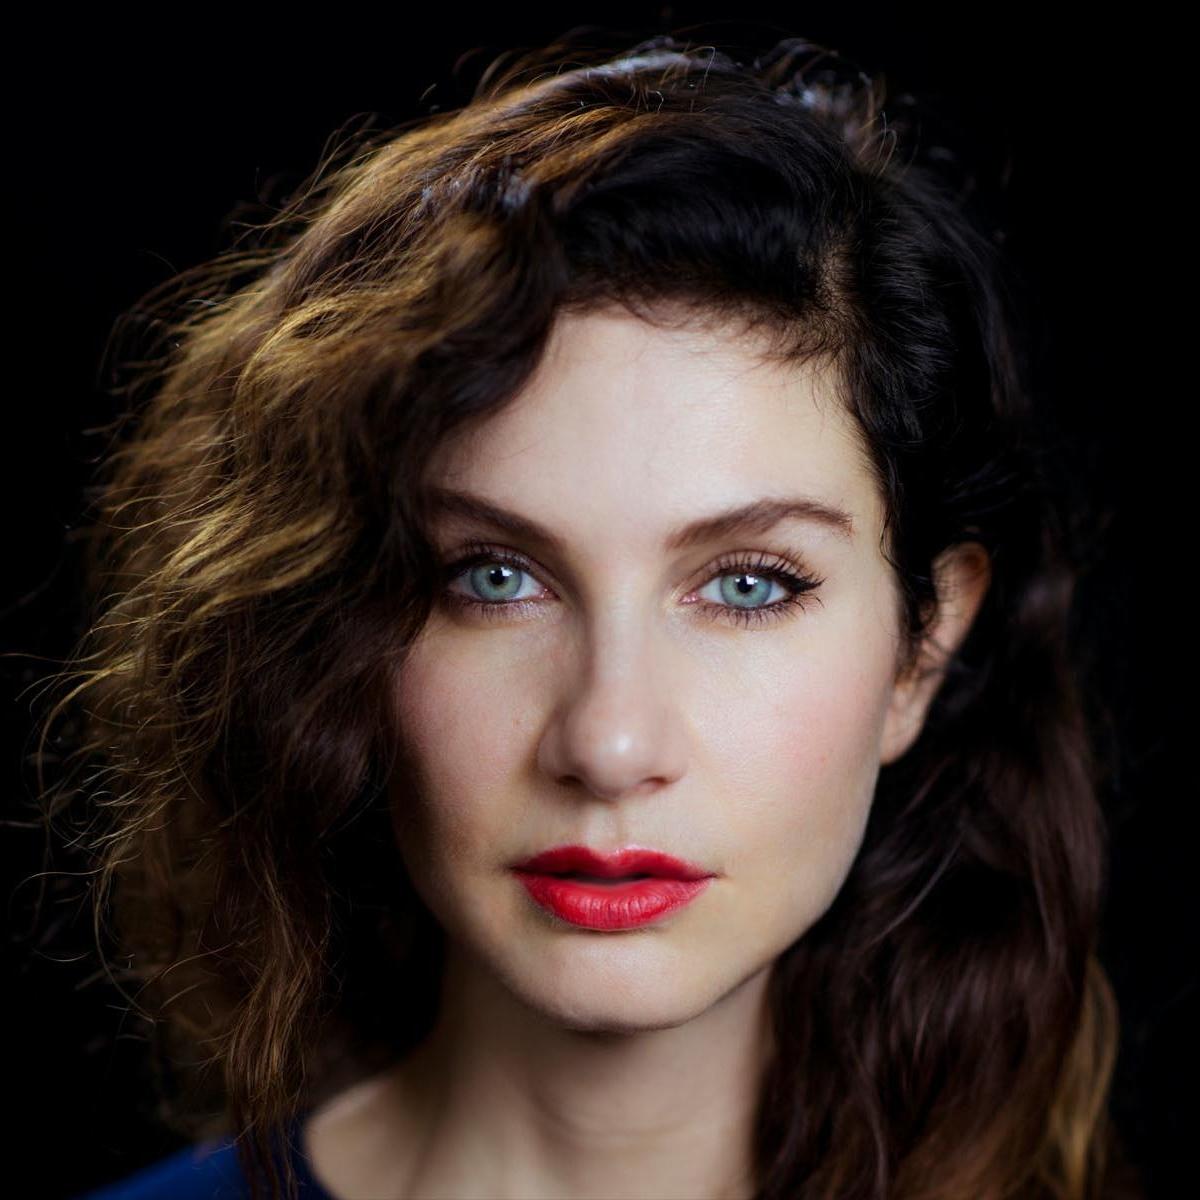 Adina Popescu   #ClimateChange #Blockchain #ImmersiveMedia #Storytelling #Future #VR #AR